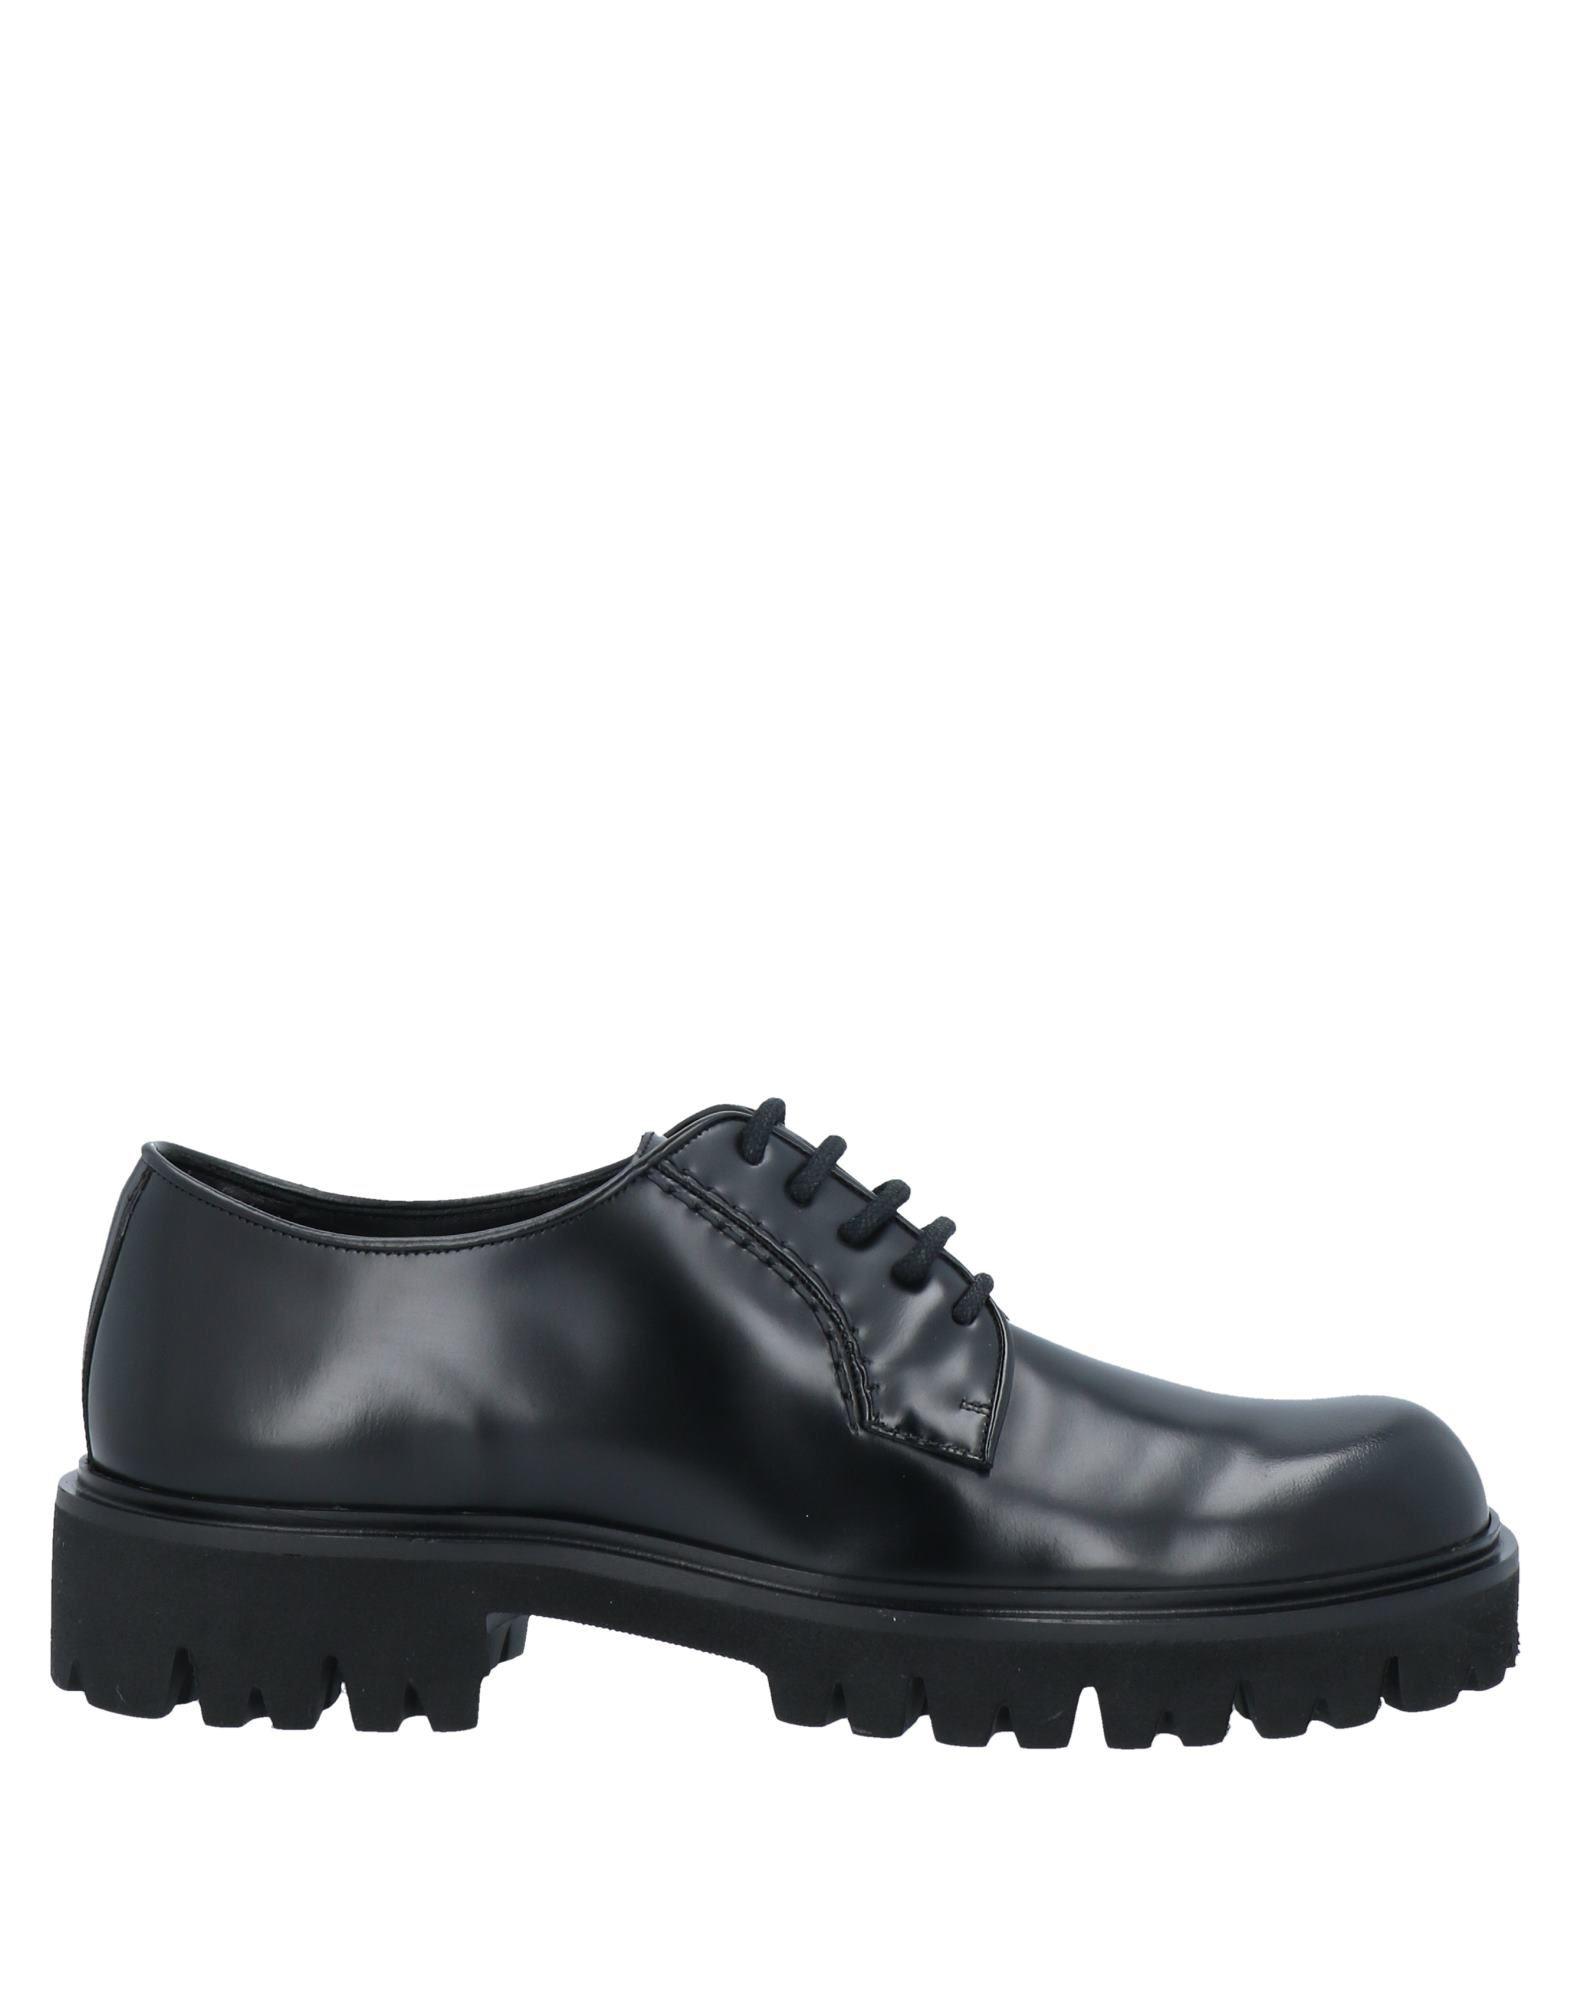 Фото - LA CORTE DELLA PELLE by FRANCO BALLIN Обувь на шнурках franco fedele обувь на шнурках